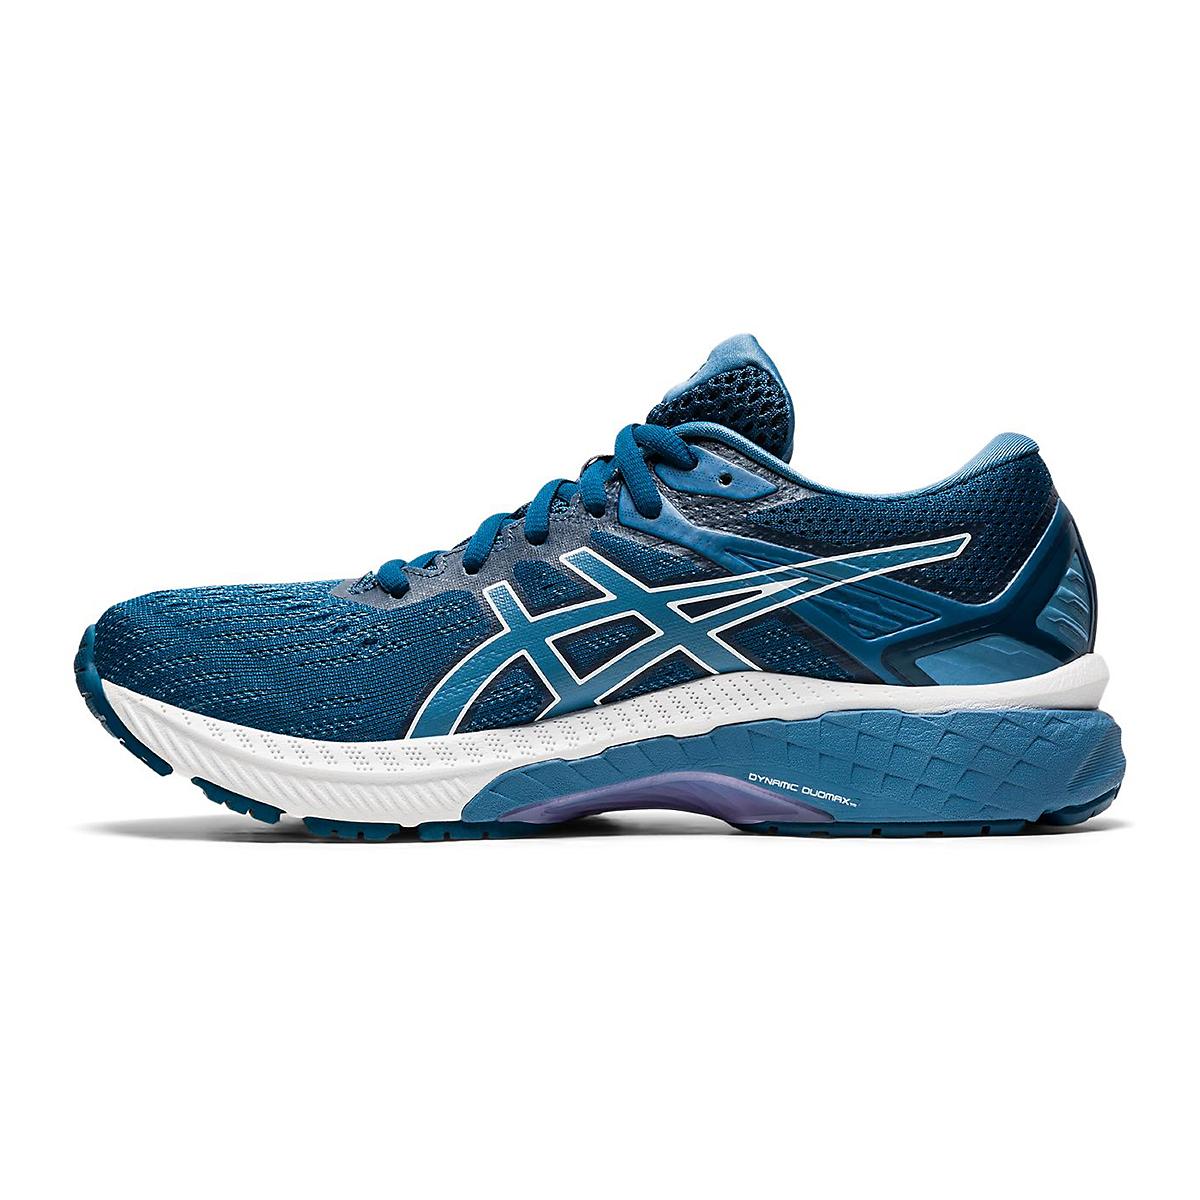 Women's Asics Gt-2000 9 Running Shoe - Color: Mako Blue/Grey - Size: 6 - Width: Wide, Mako Blue/Grey, large, image 2